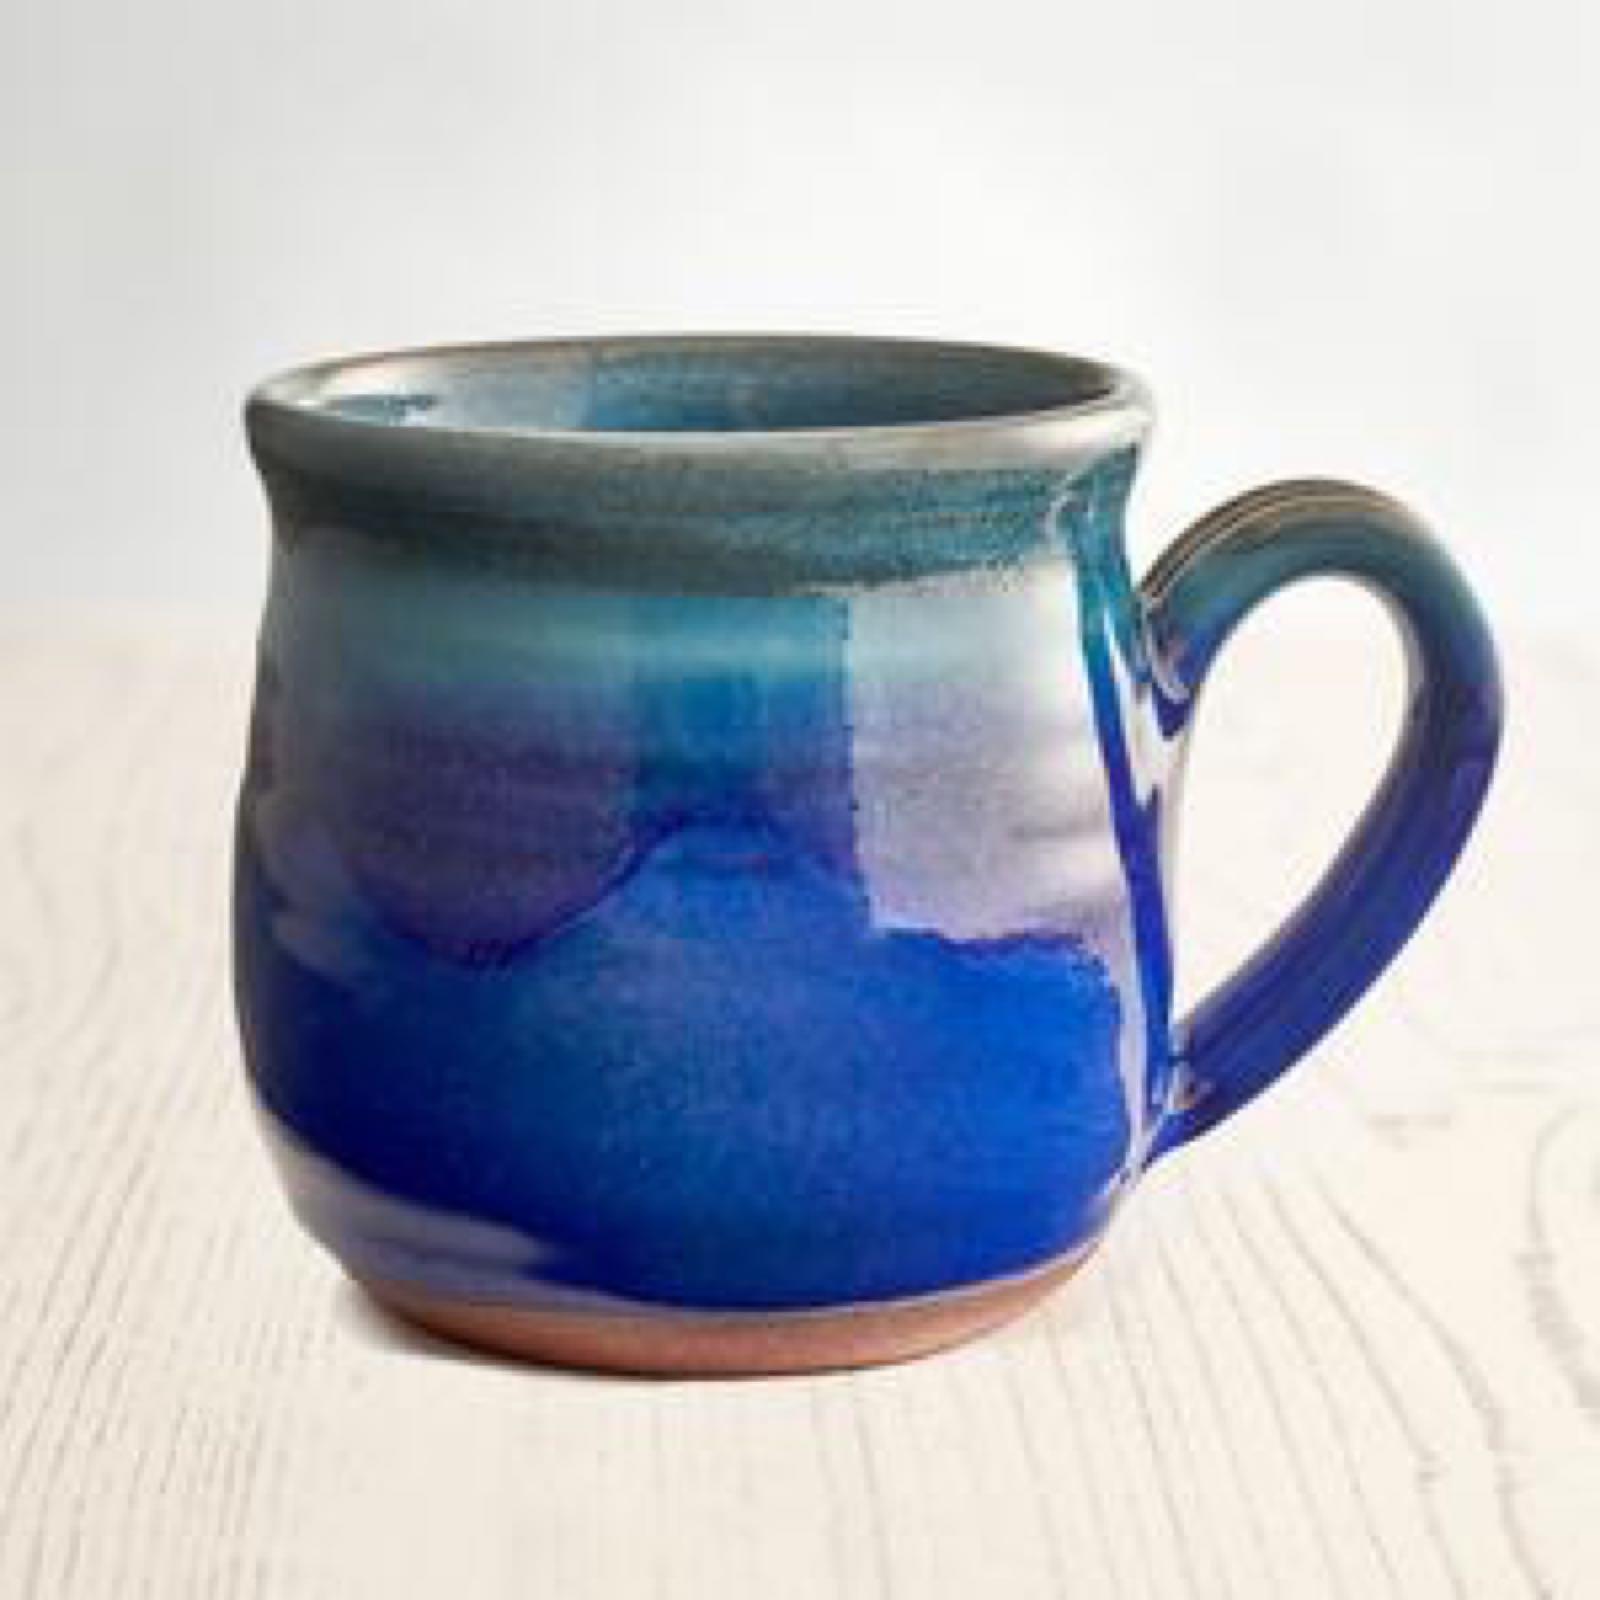 Deep Sea Blue Mug by Rupert Blamire